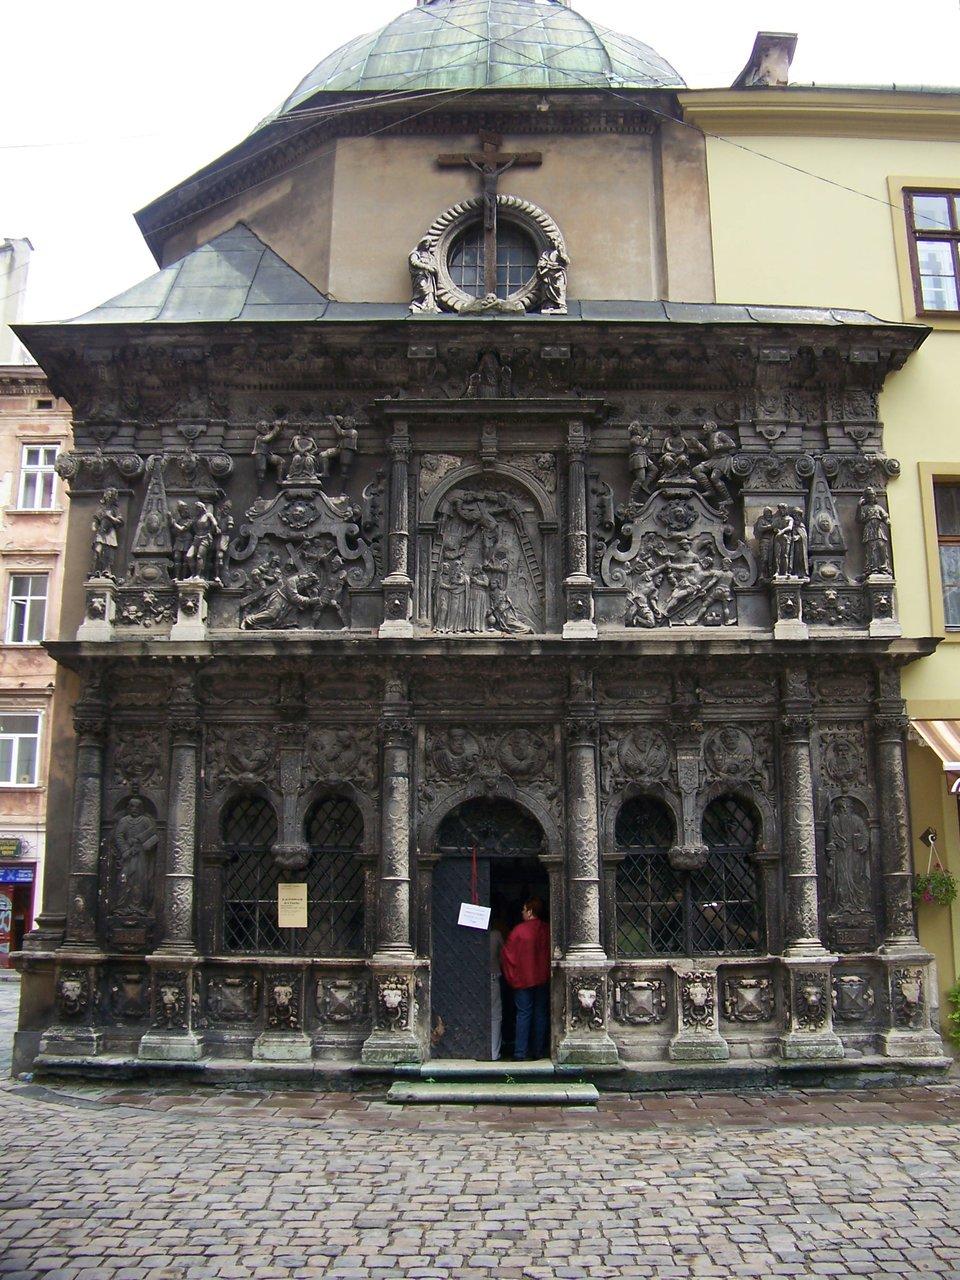 Kaplica Boimów we Lwowie Kaplica Boimów we Lwowie Źródło: Wikimedia Commons, licencja: CC BY-SA 3.0.